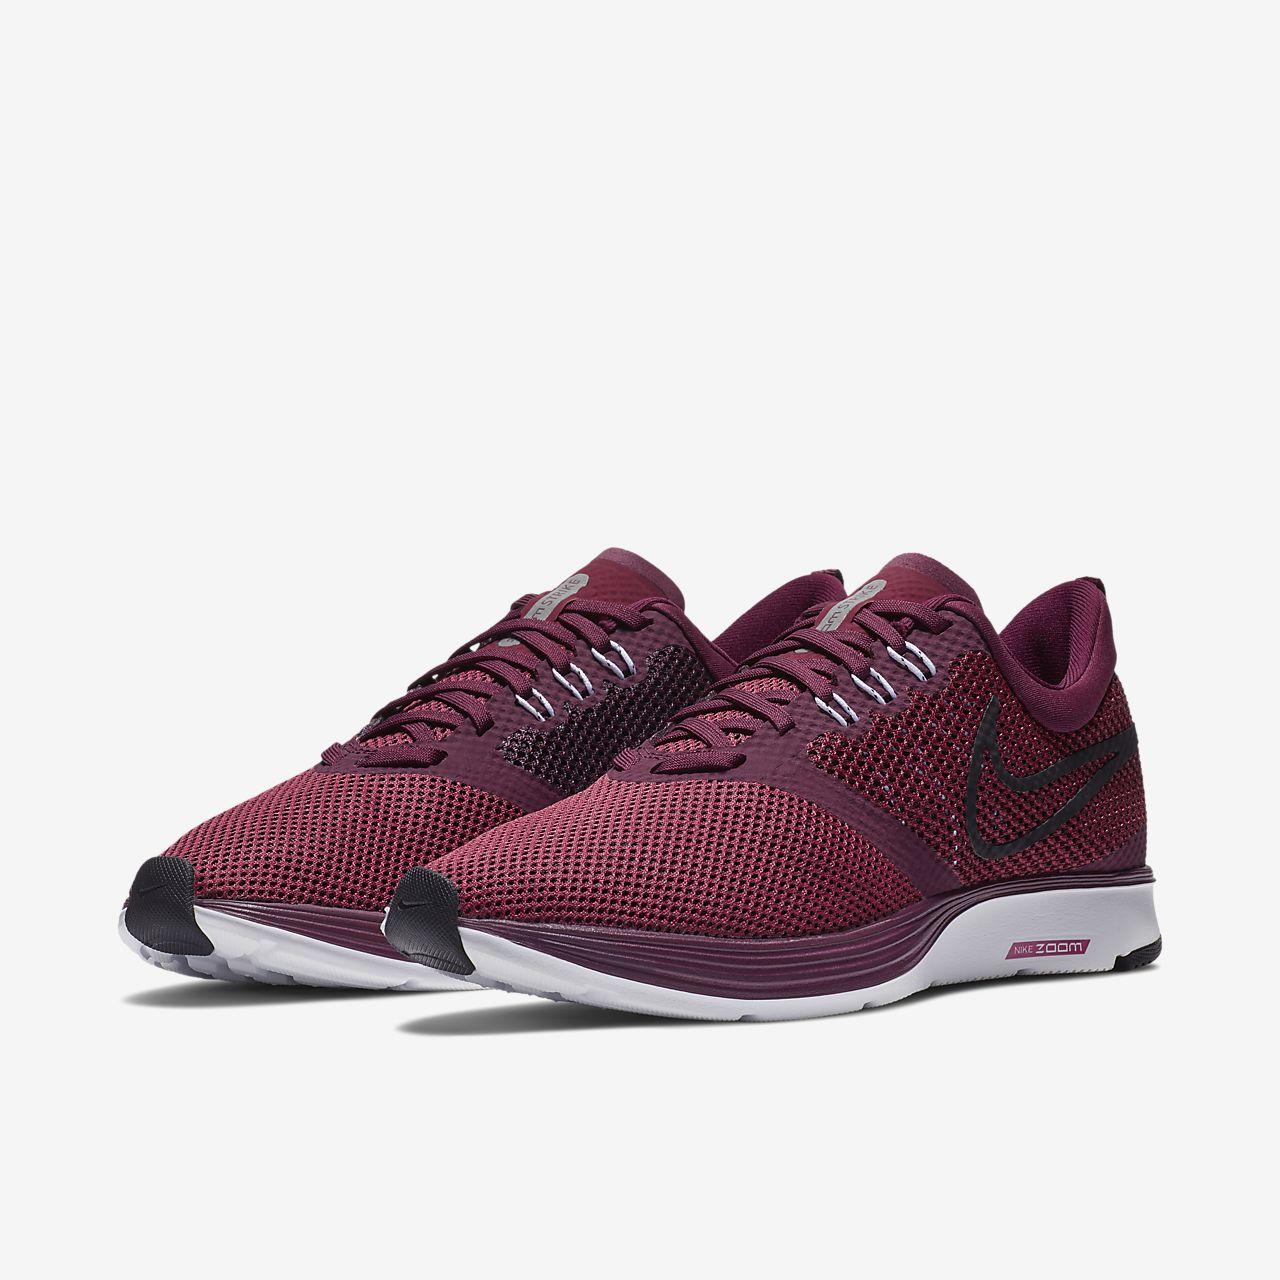 Nike Zoom Strike Women's ... Running Shoes discount from china cheap sale sneakernews Jmk0NRE